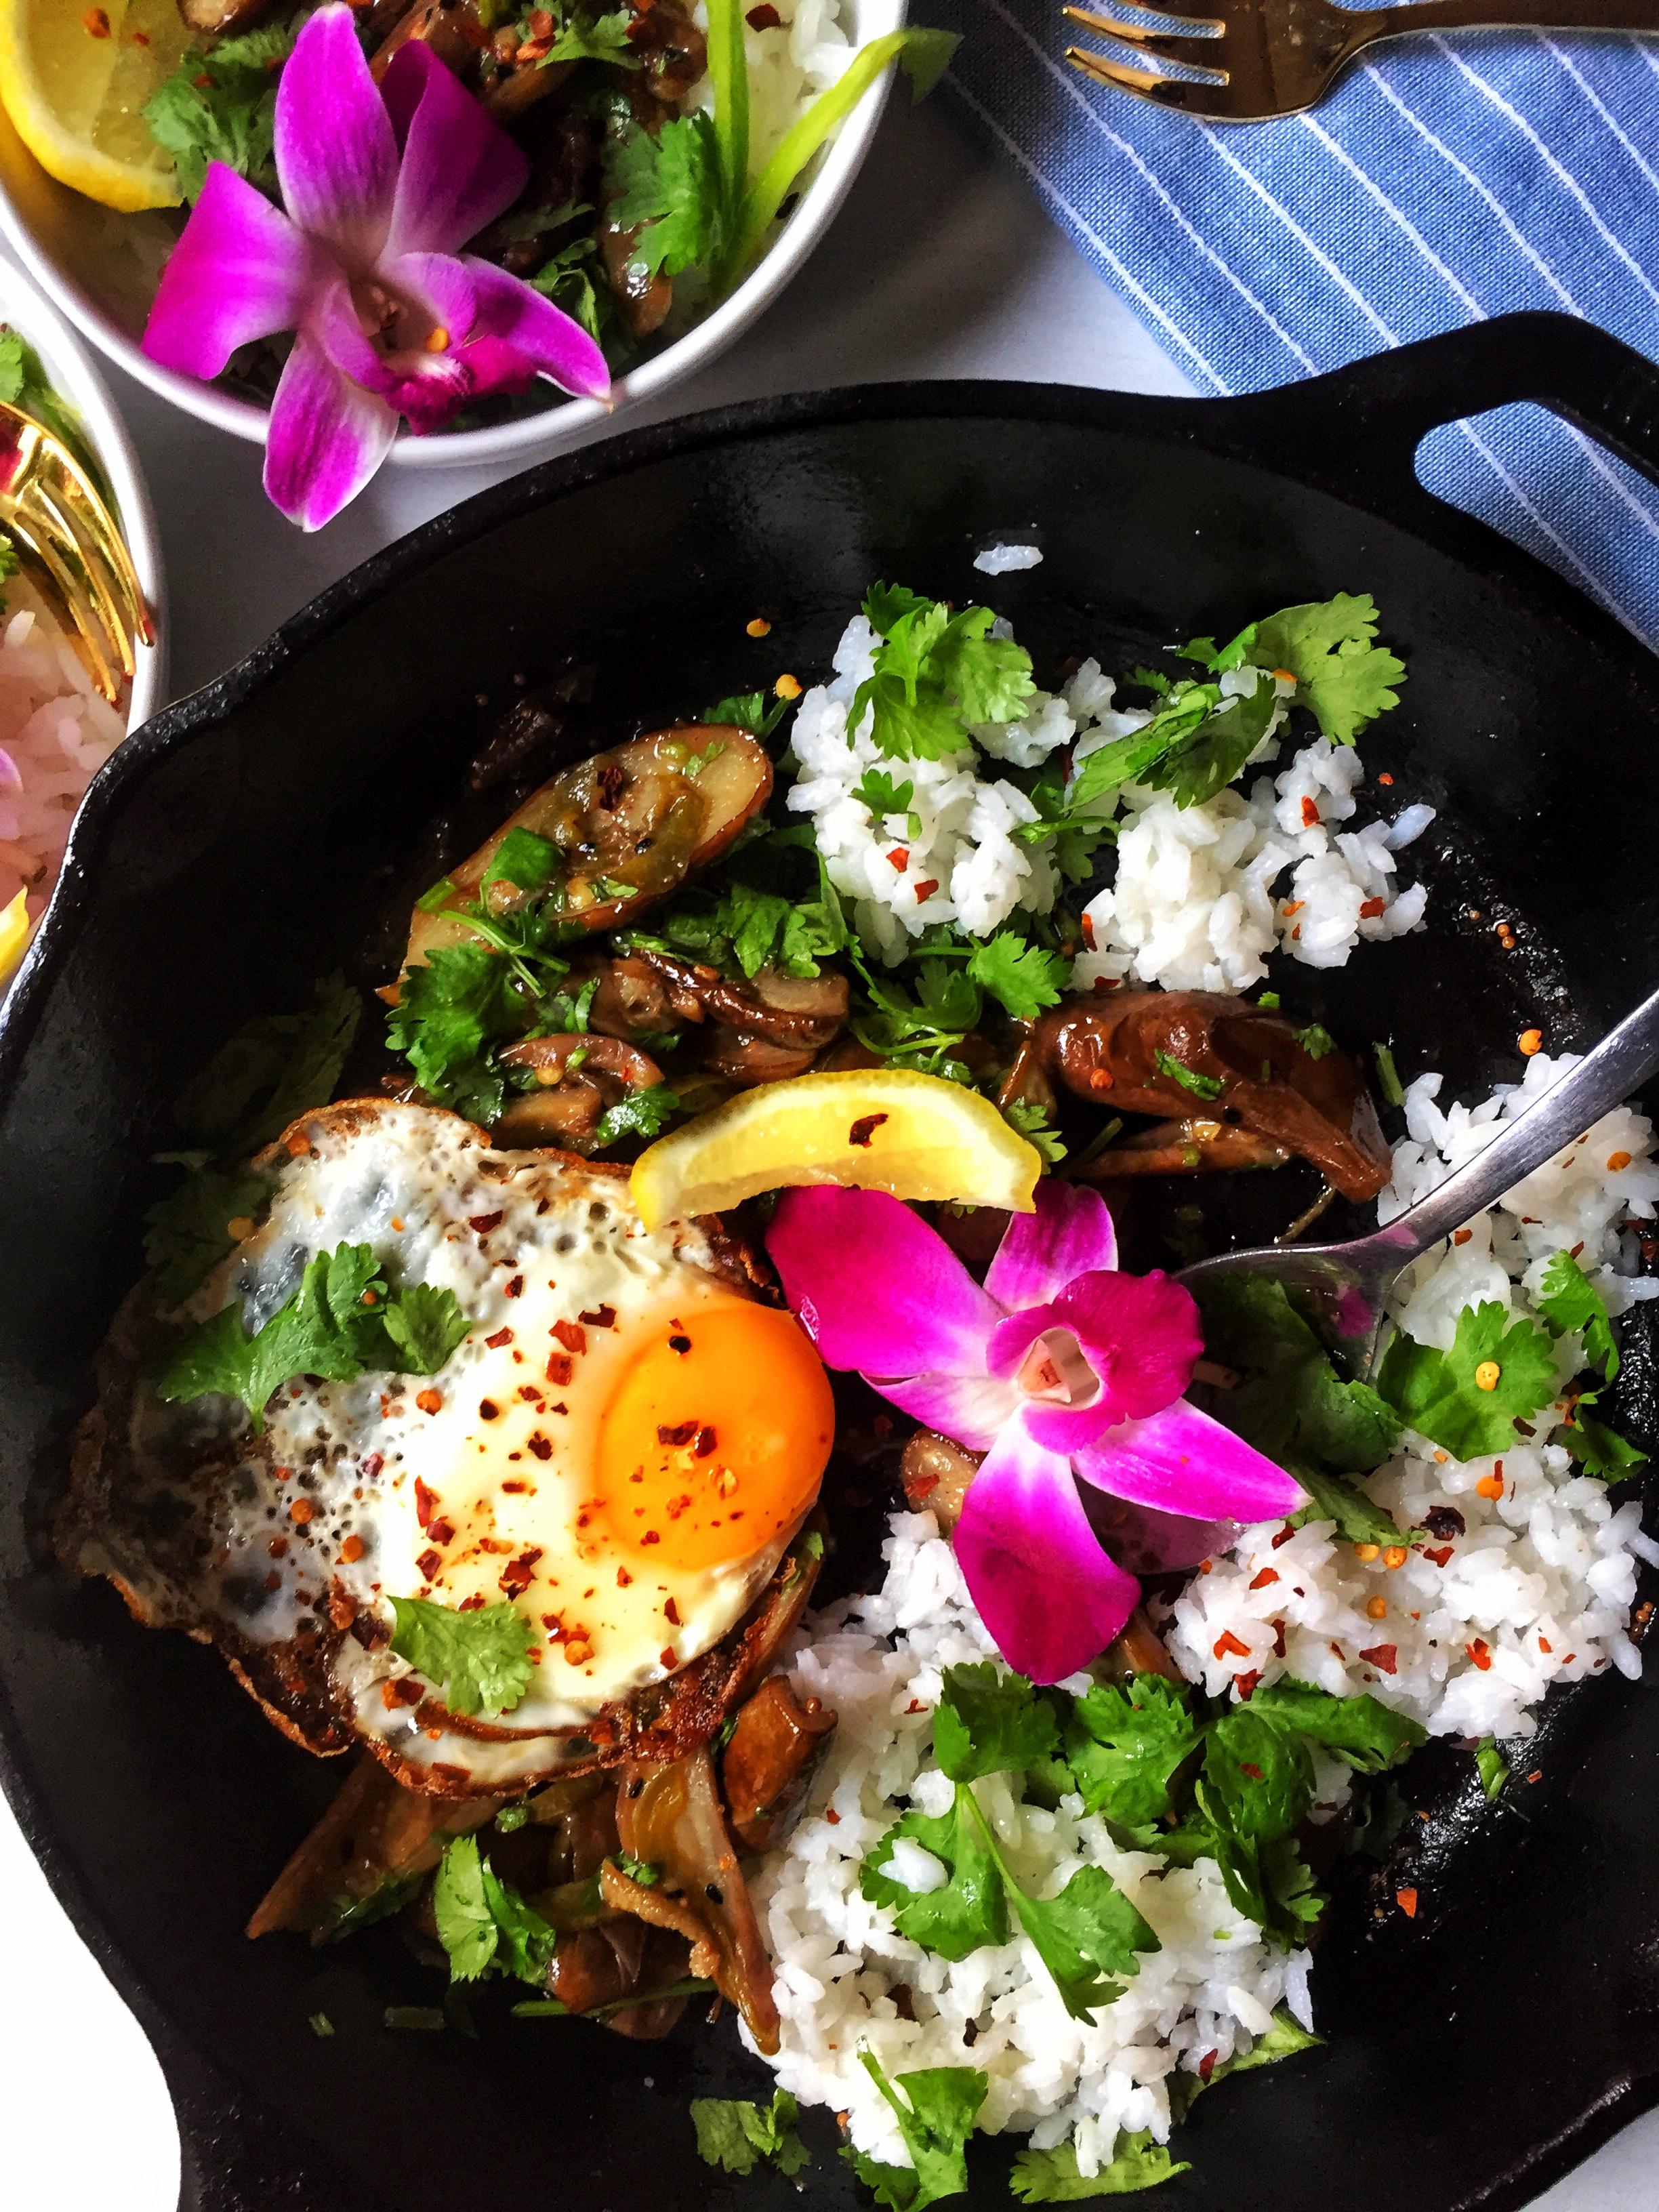 begun'er tok: bengali charred eggplants with a sweet & spicy tamarind glaze